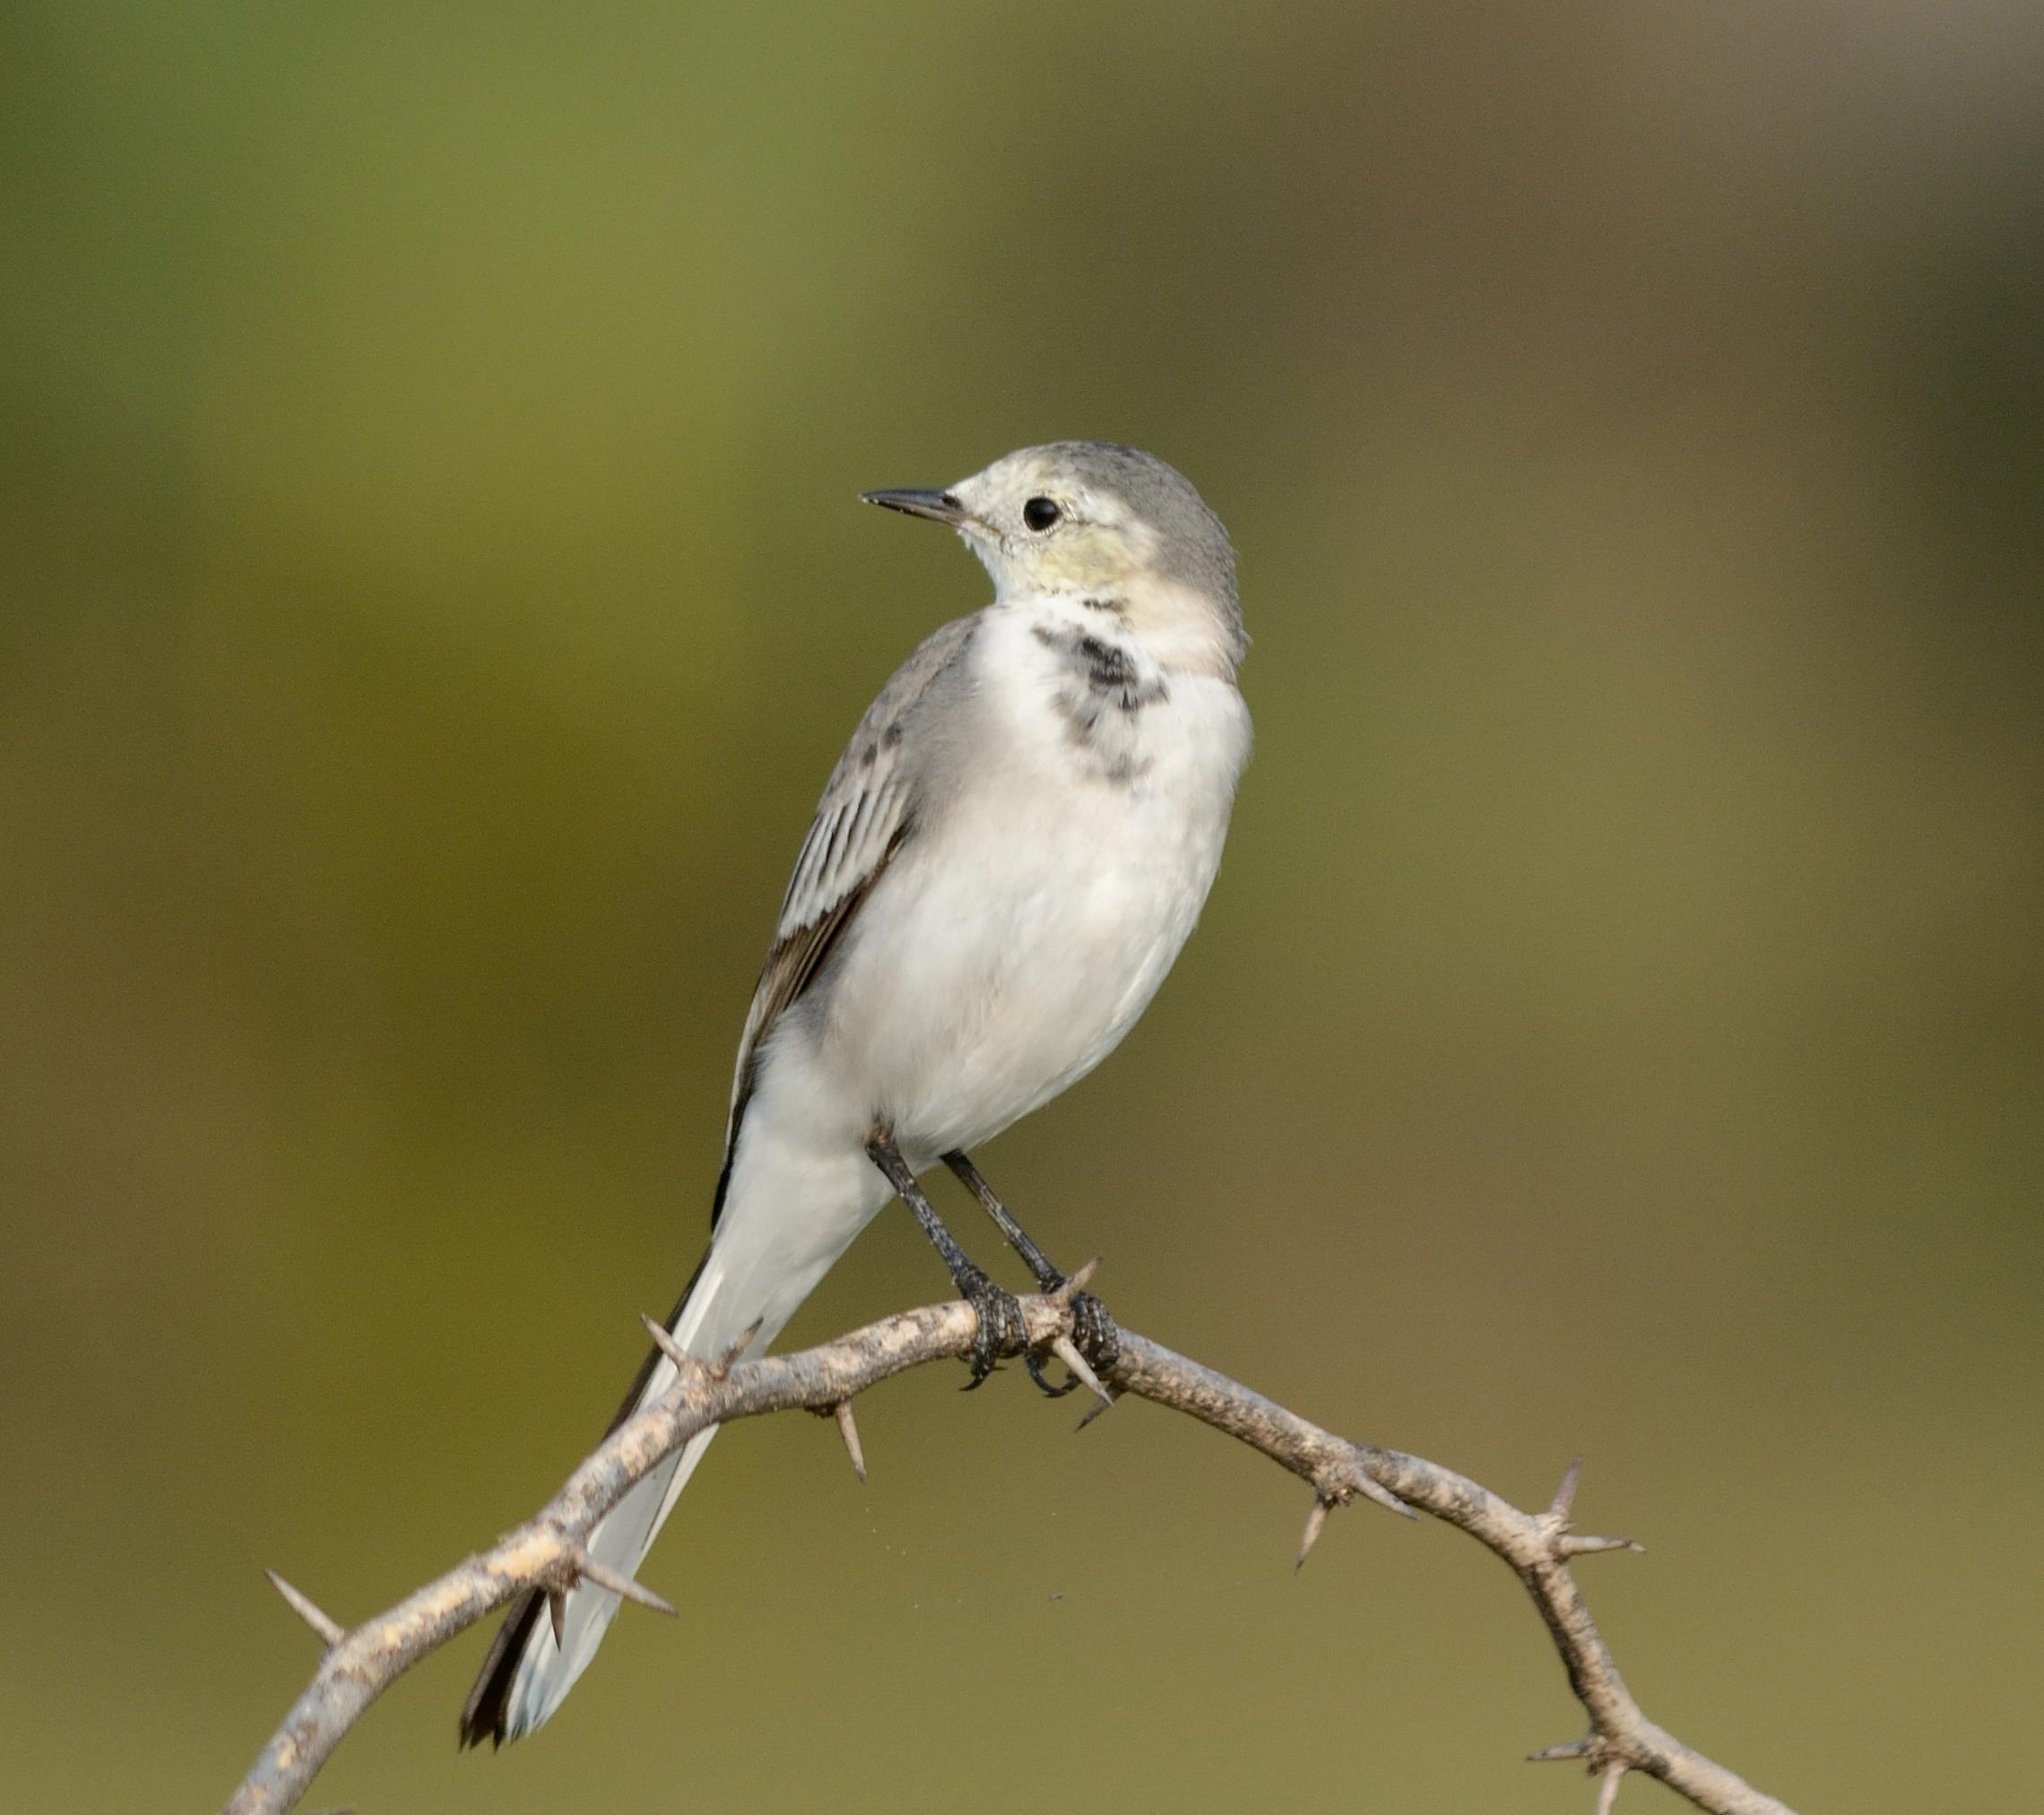 Bird in Branch of Tree on Focus